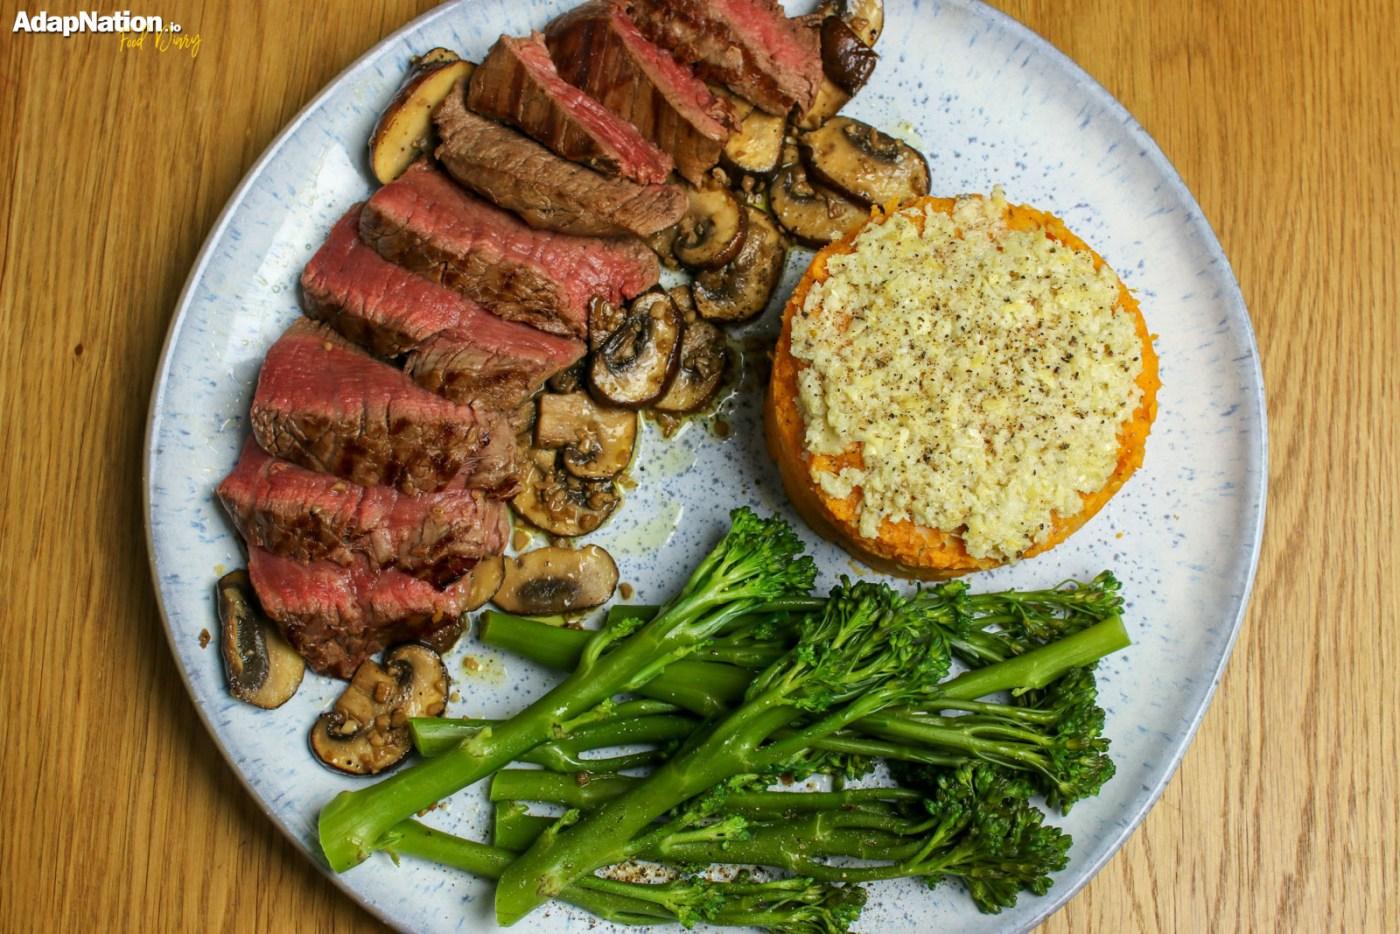 Fillet Steak, Artichoke & Sweet Potato Mash and Chestnut Mushrooms